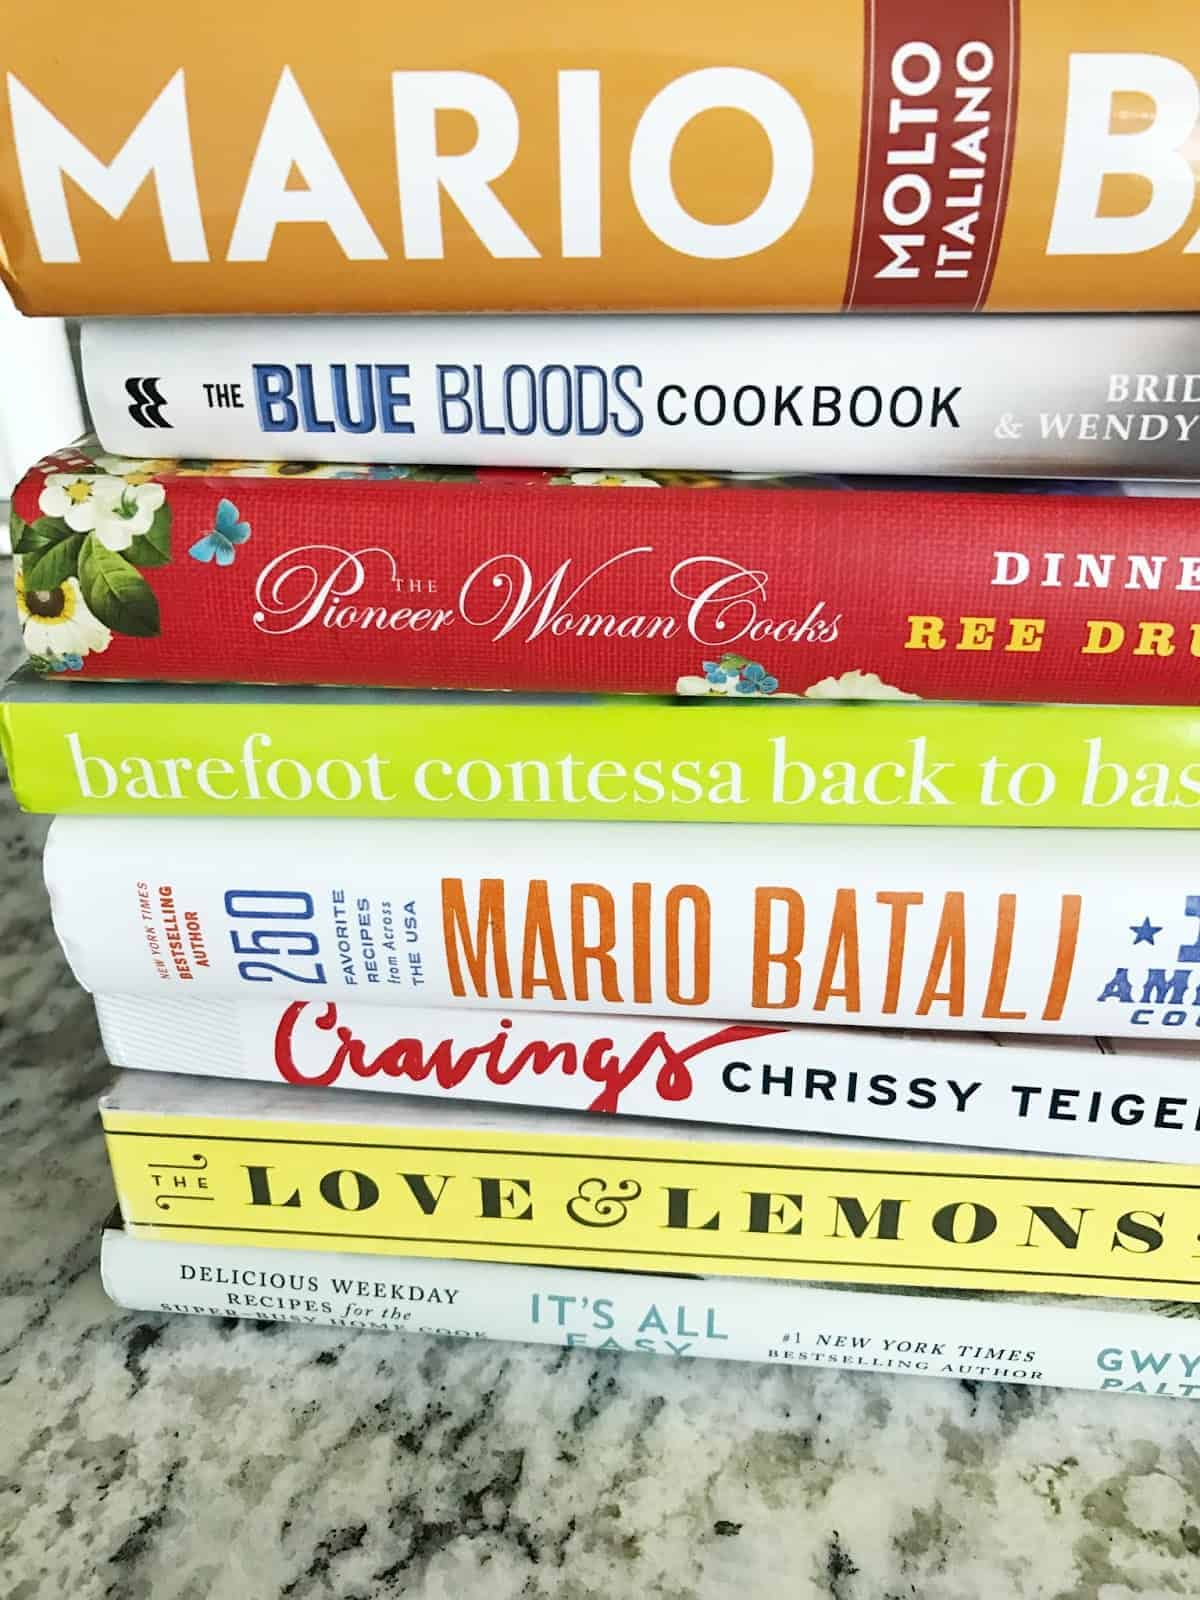 Favorite Cookbooks (so far anyway)